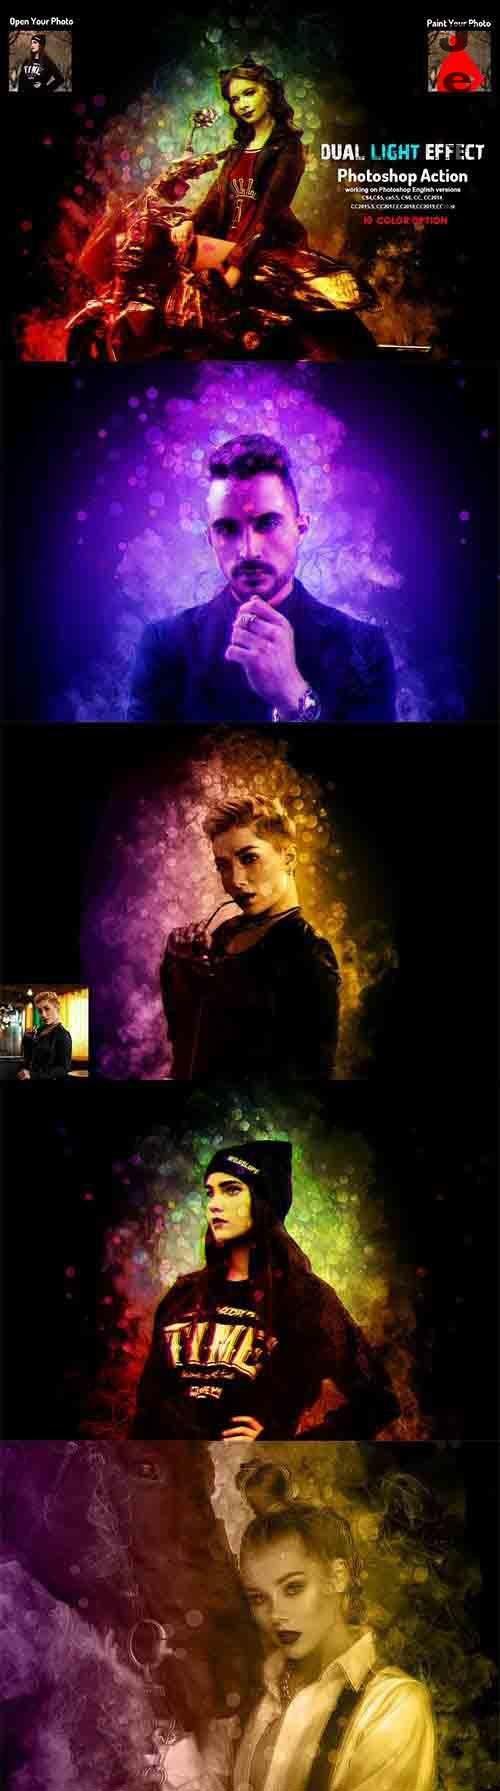 CreativeMarket - Dual Light Effect Photoshop Action 5917432